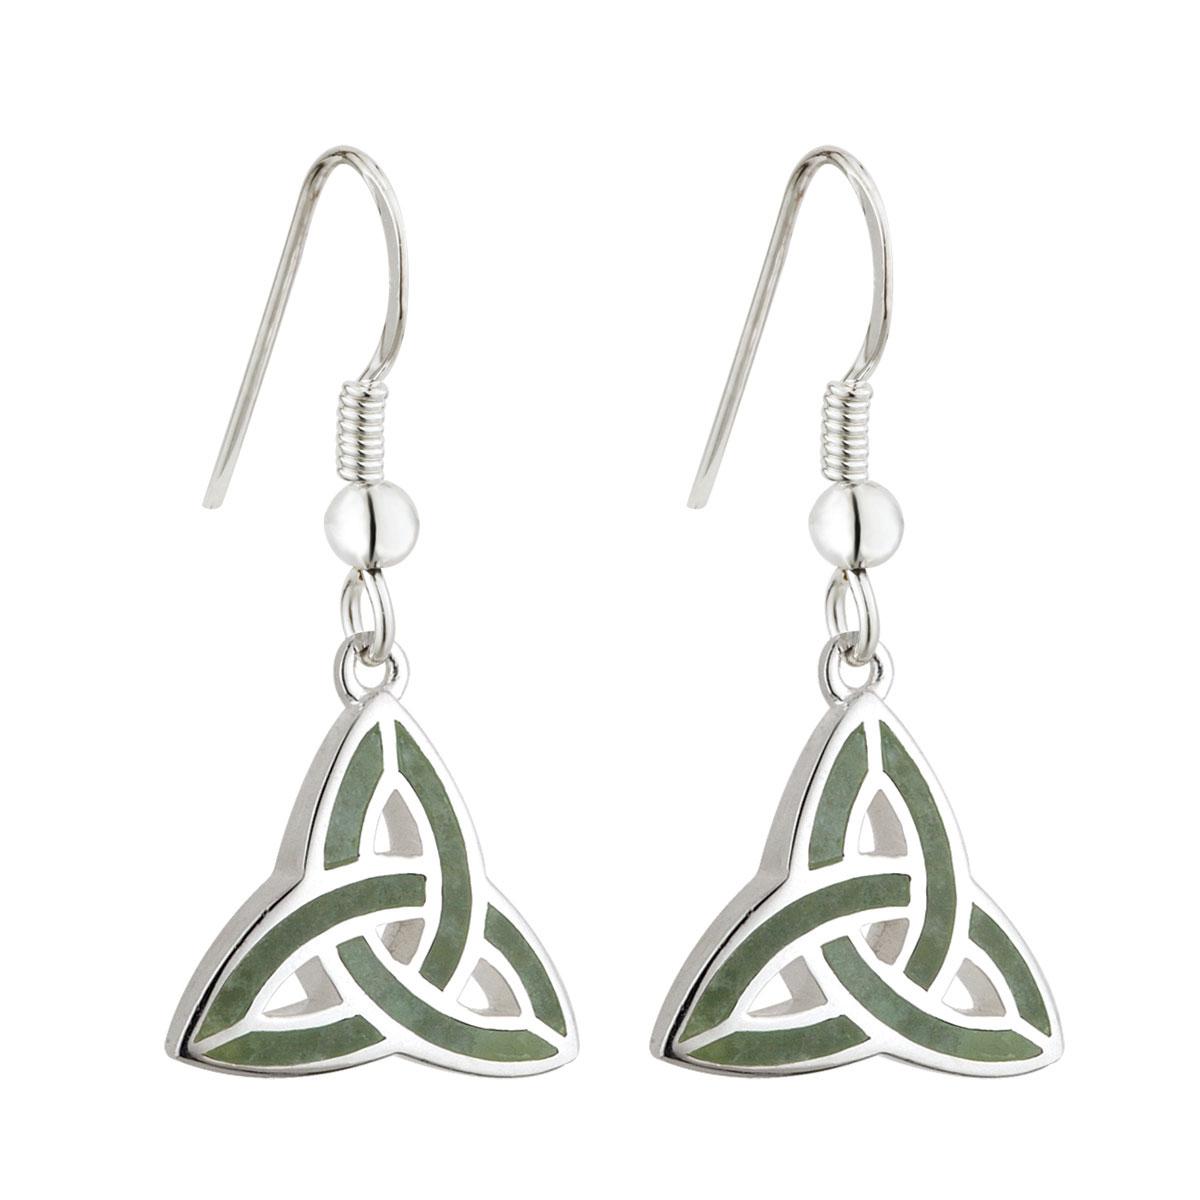 Cashs Ireland, Sterling Silver Connemara Marble Trinity Knot Drop Earrings